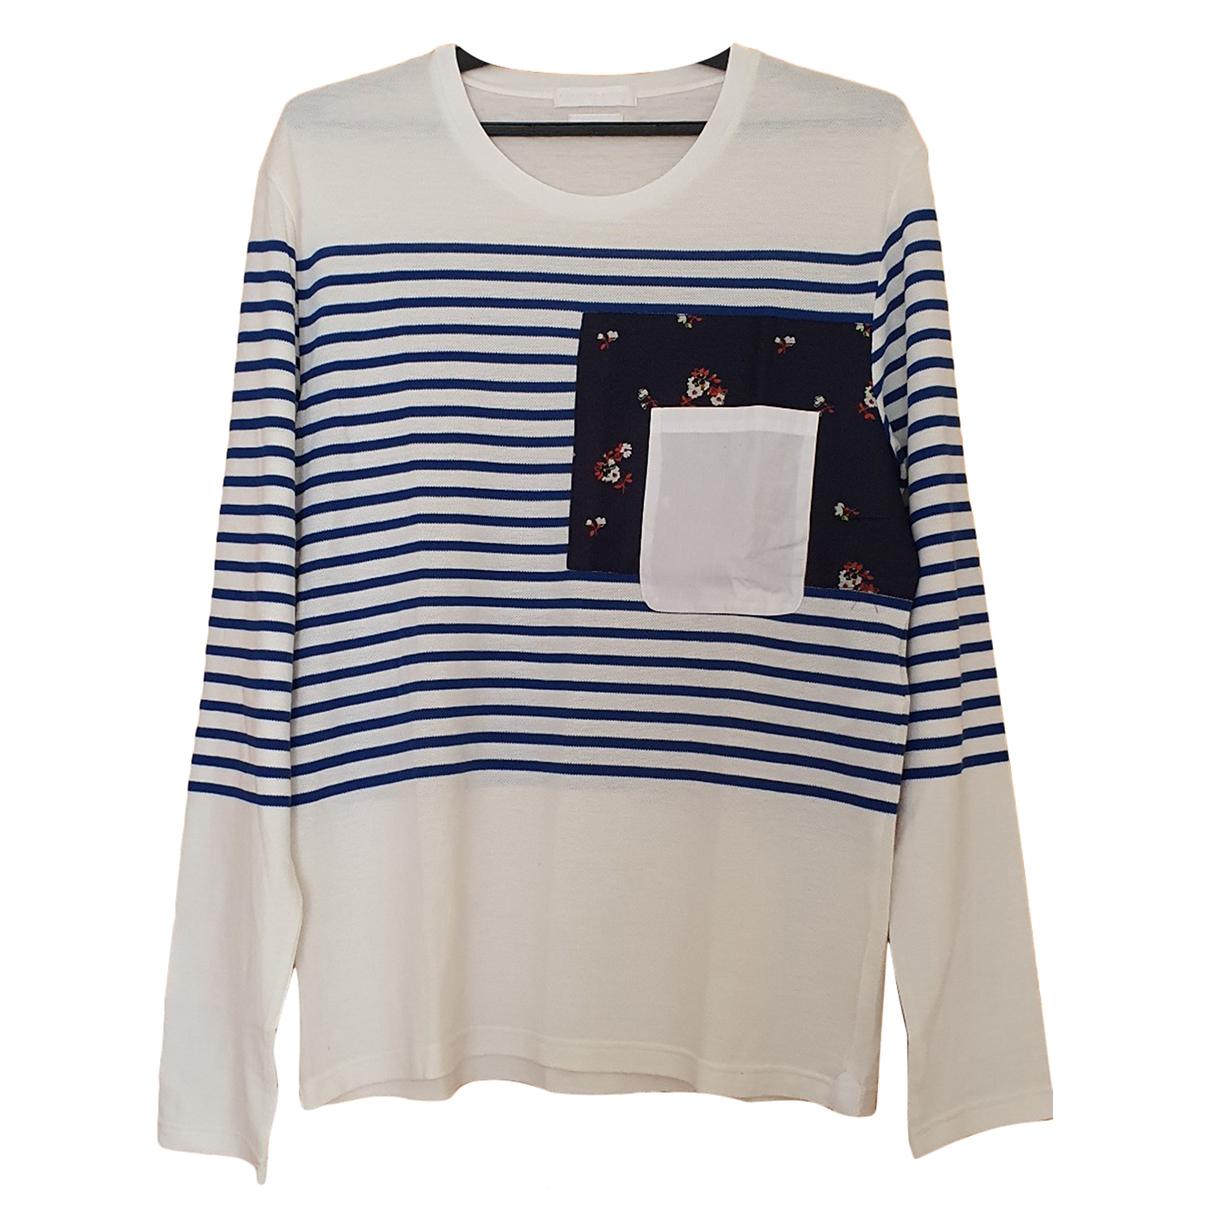 Alexander Mcqueen - Tee shirts   pour homme en coton - blanc